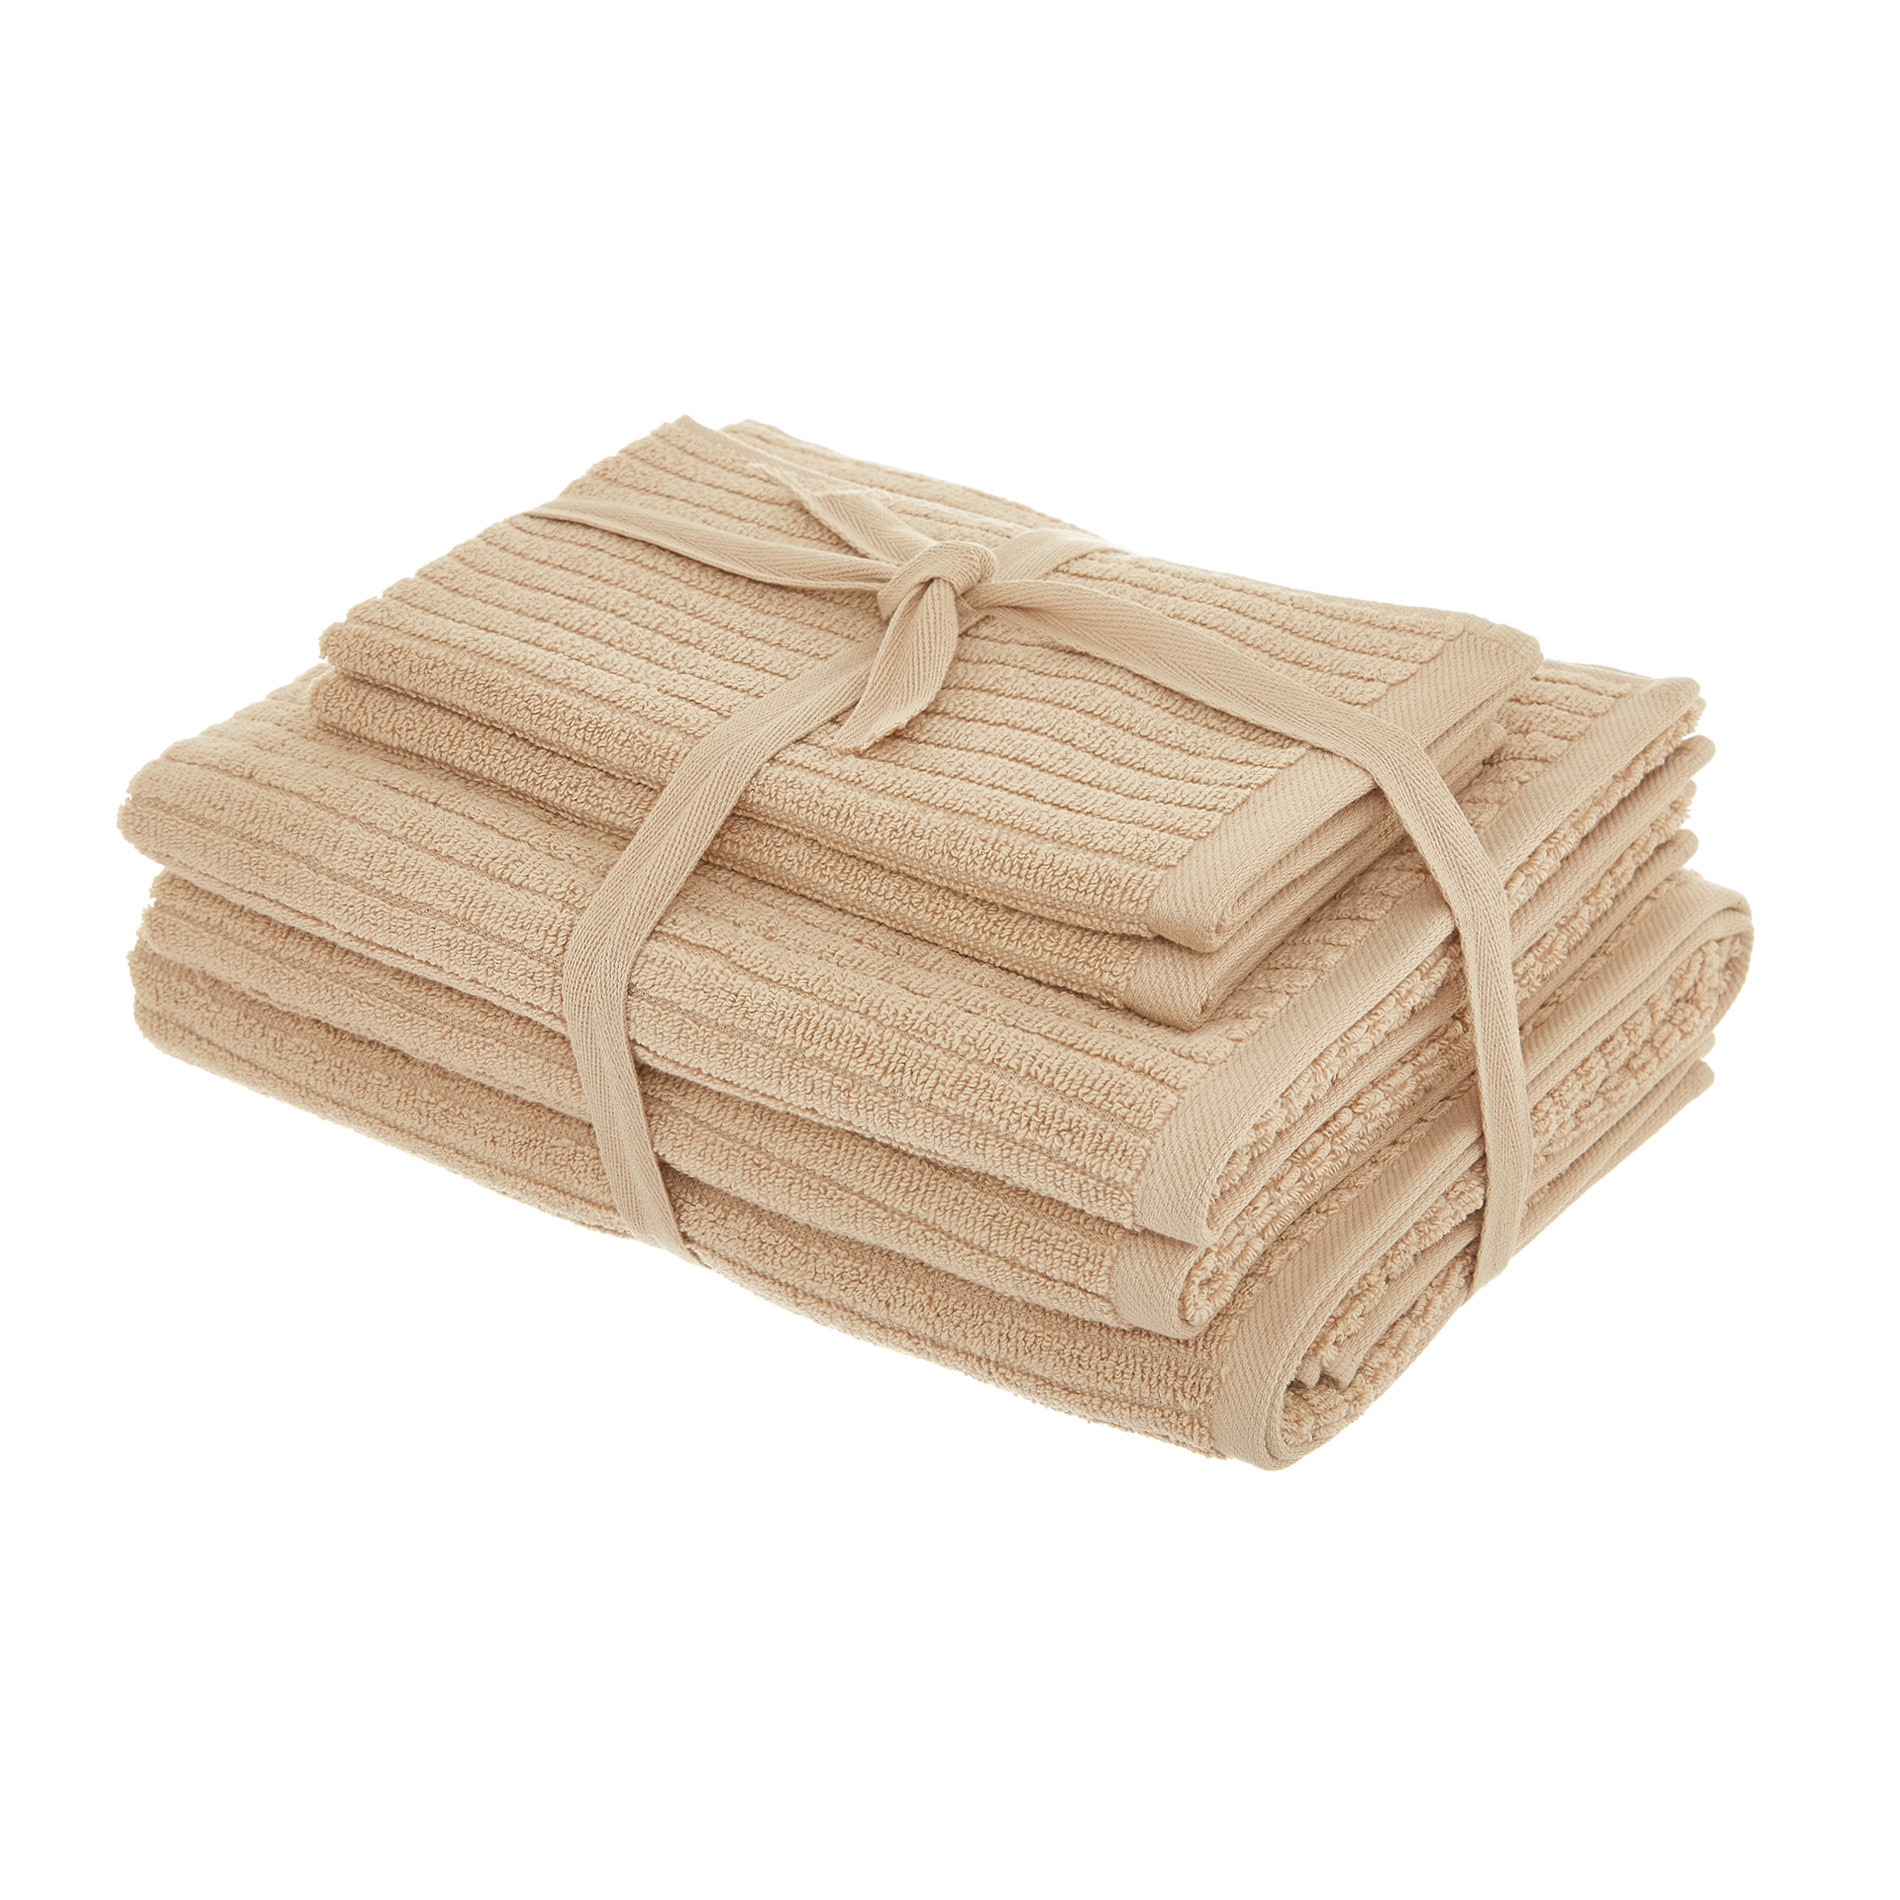 Set asciugamani puro cotone righe jacquard tinta unita, Beige, large image number 0